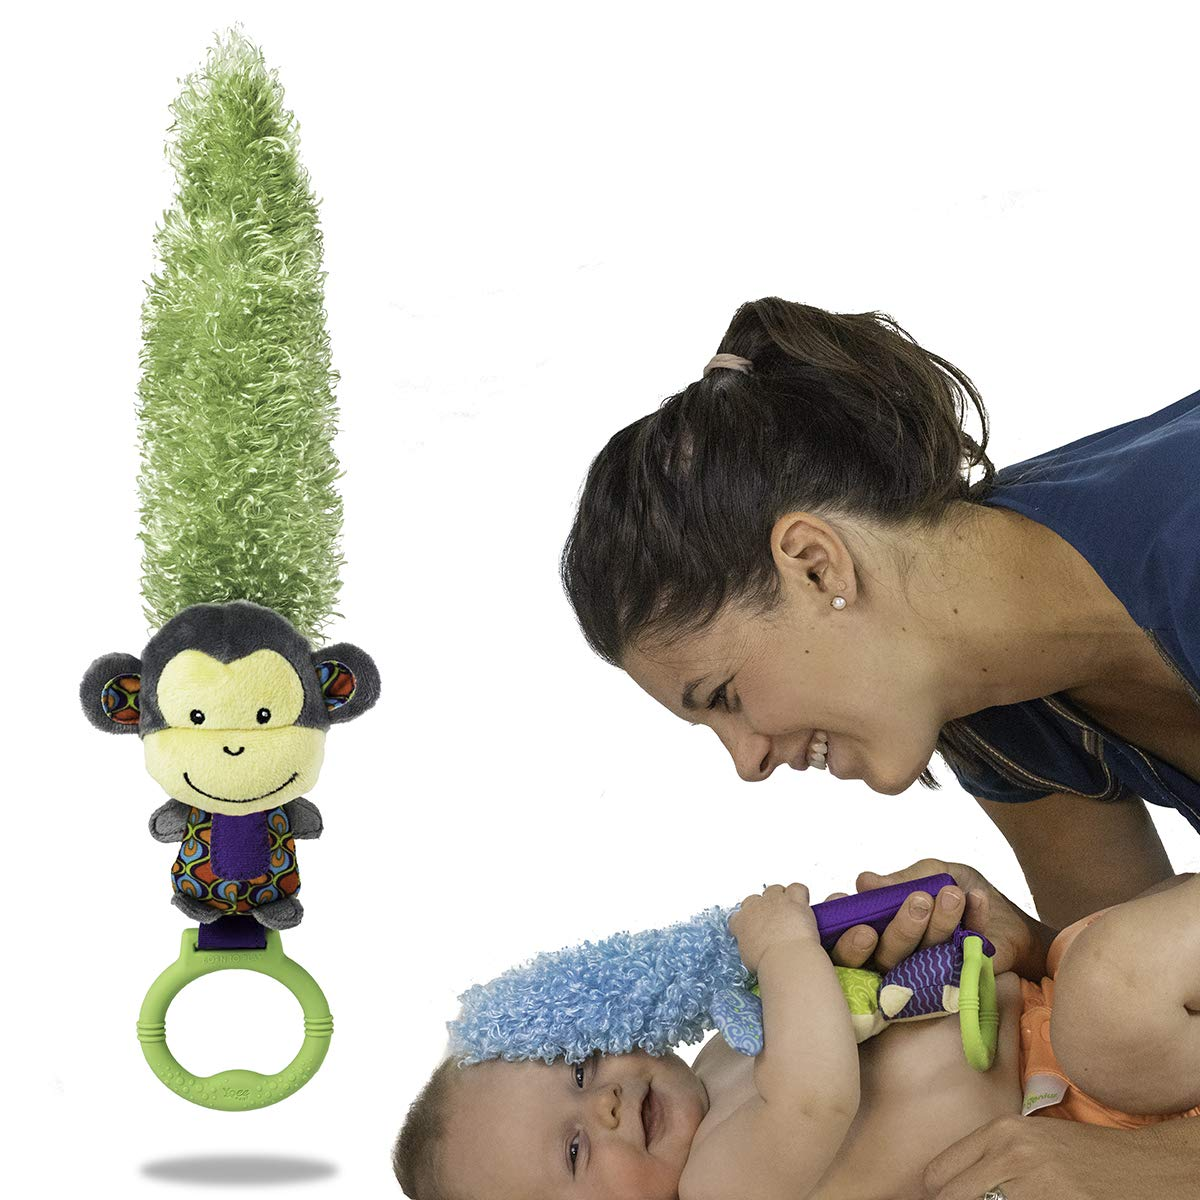 Yoee Baby Monkey Newborn Baby Toy Encourage Bonding and Development from Day One YB012